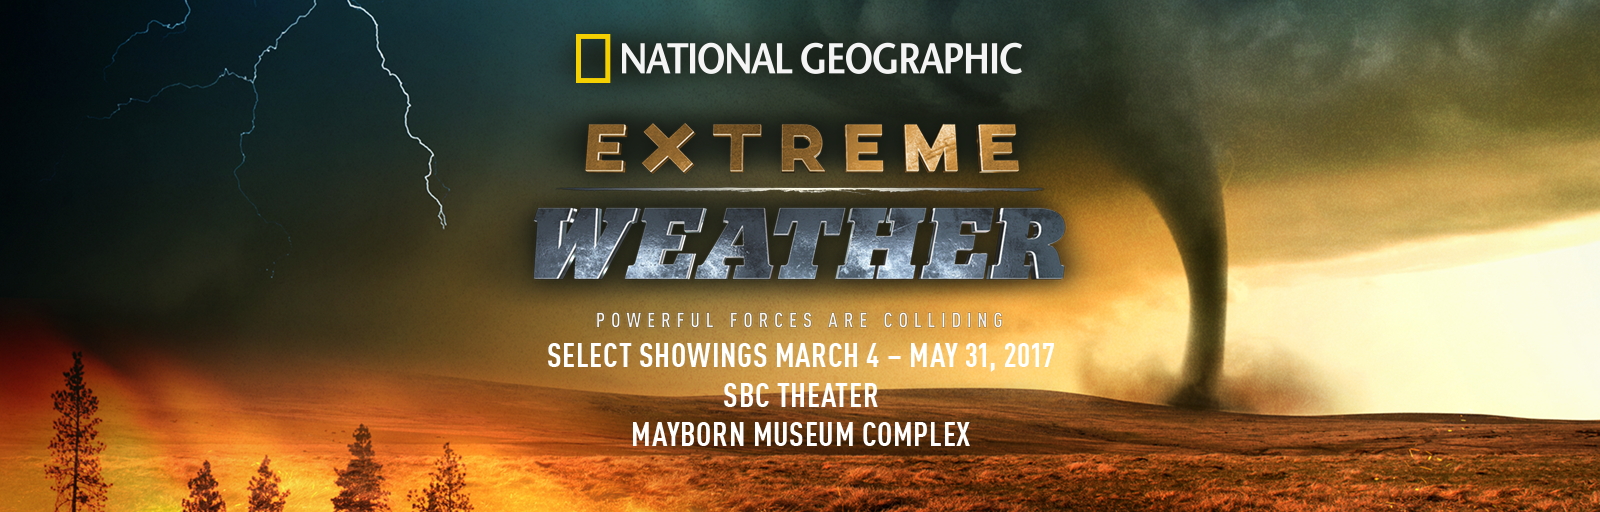 natgeoextremeweatherslider